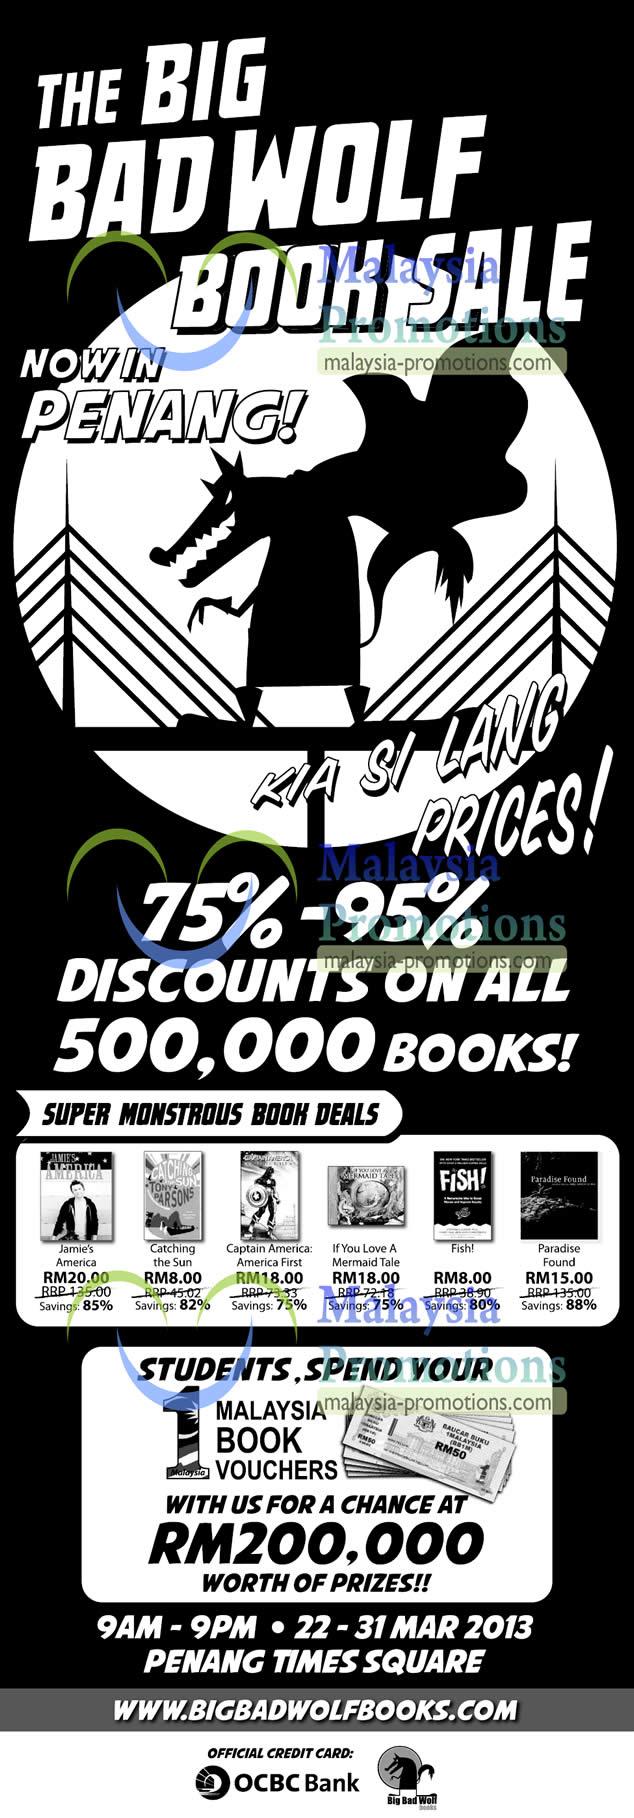 Big Bad Wolf Books Penang 22 Mar 2013